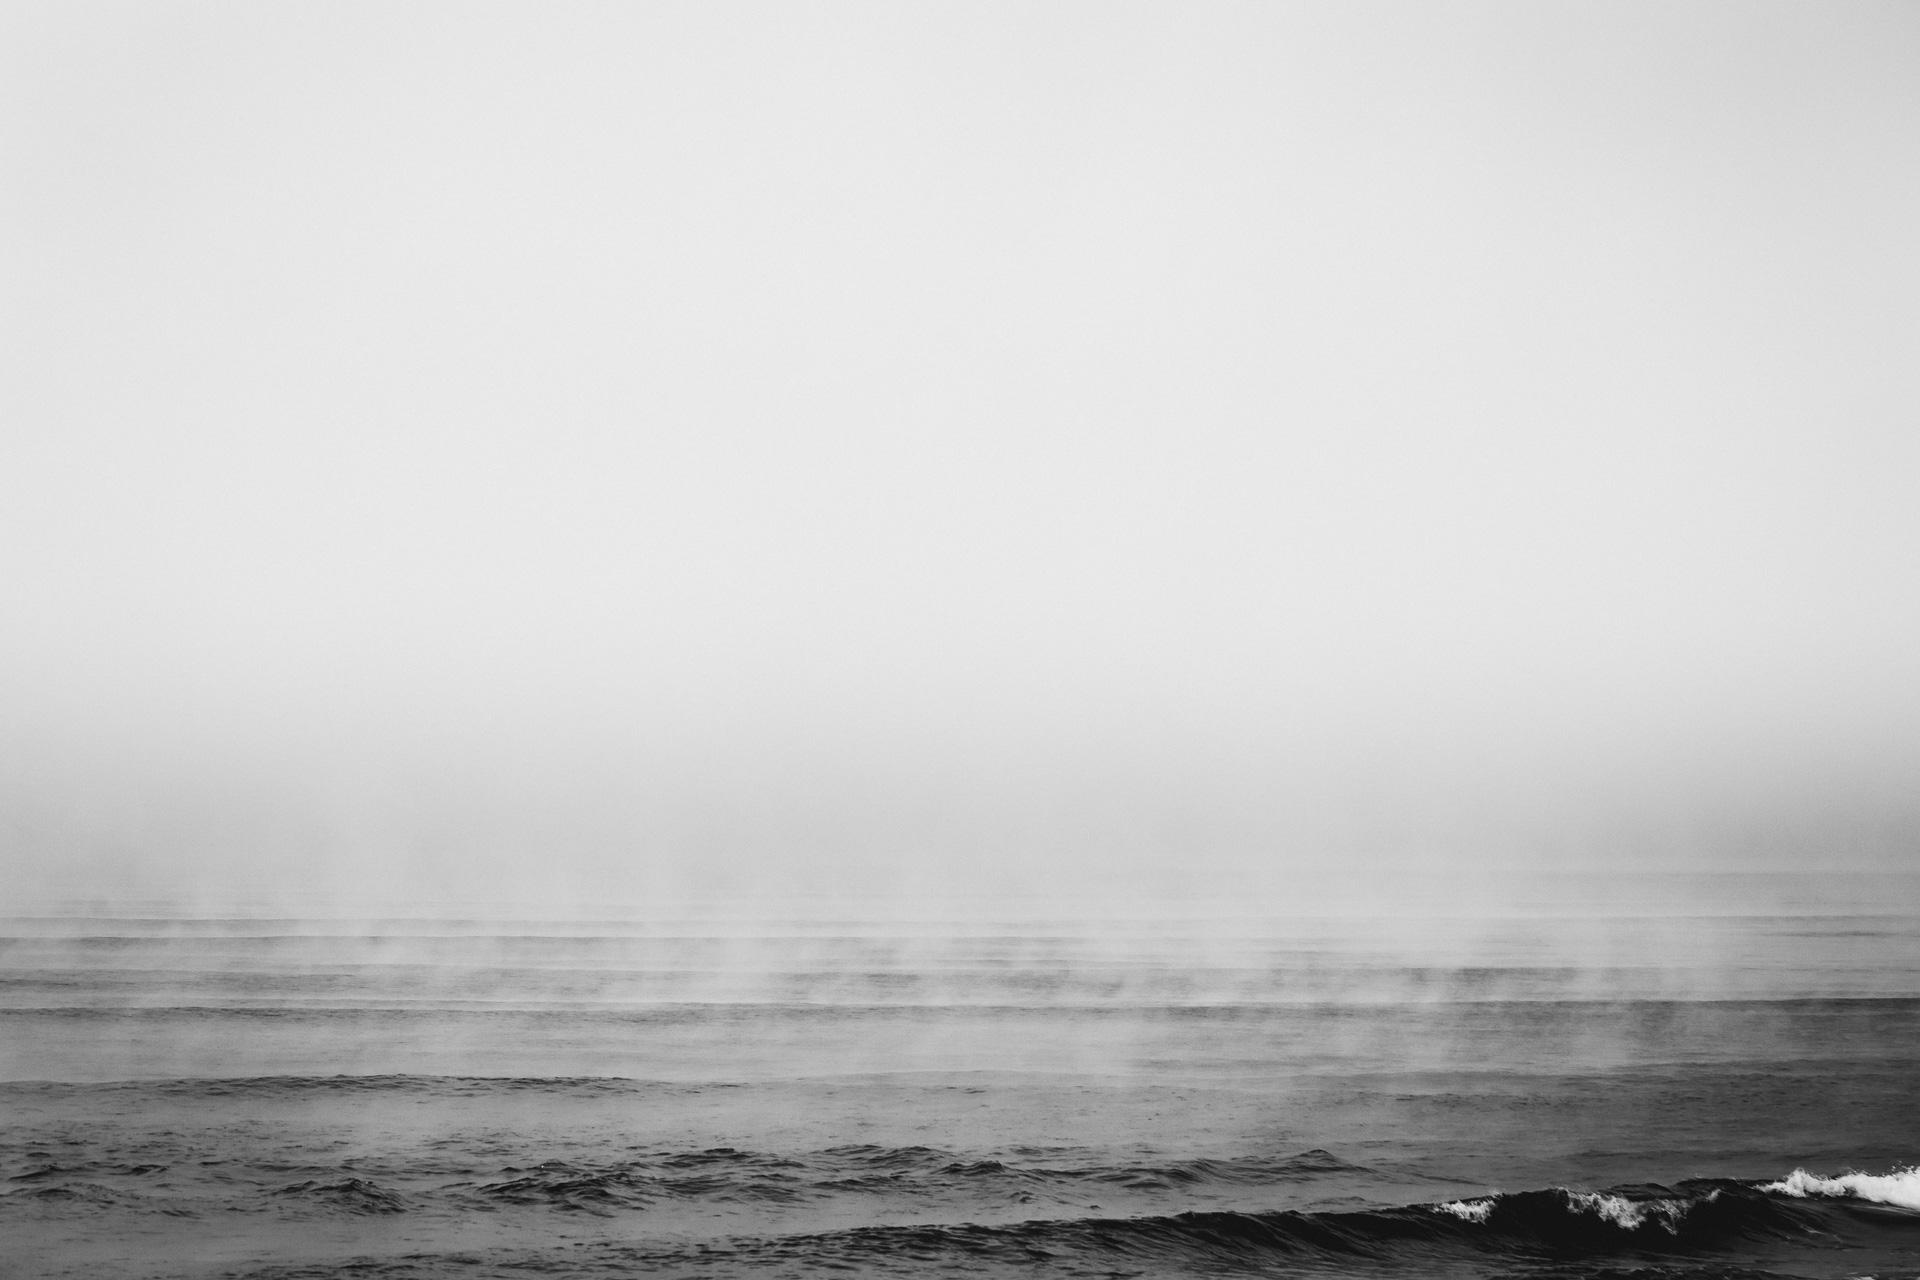 Damien-dohmen-sand-print-lx-one-15